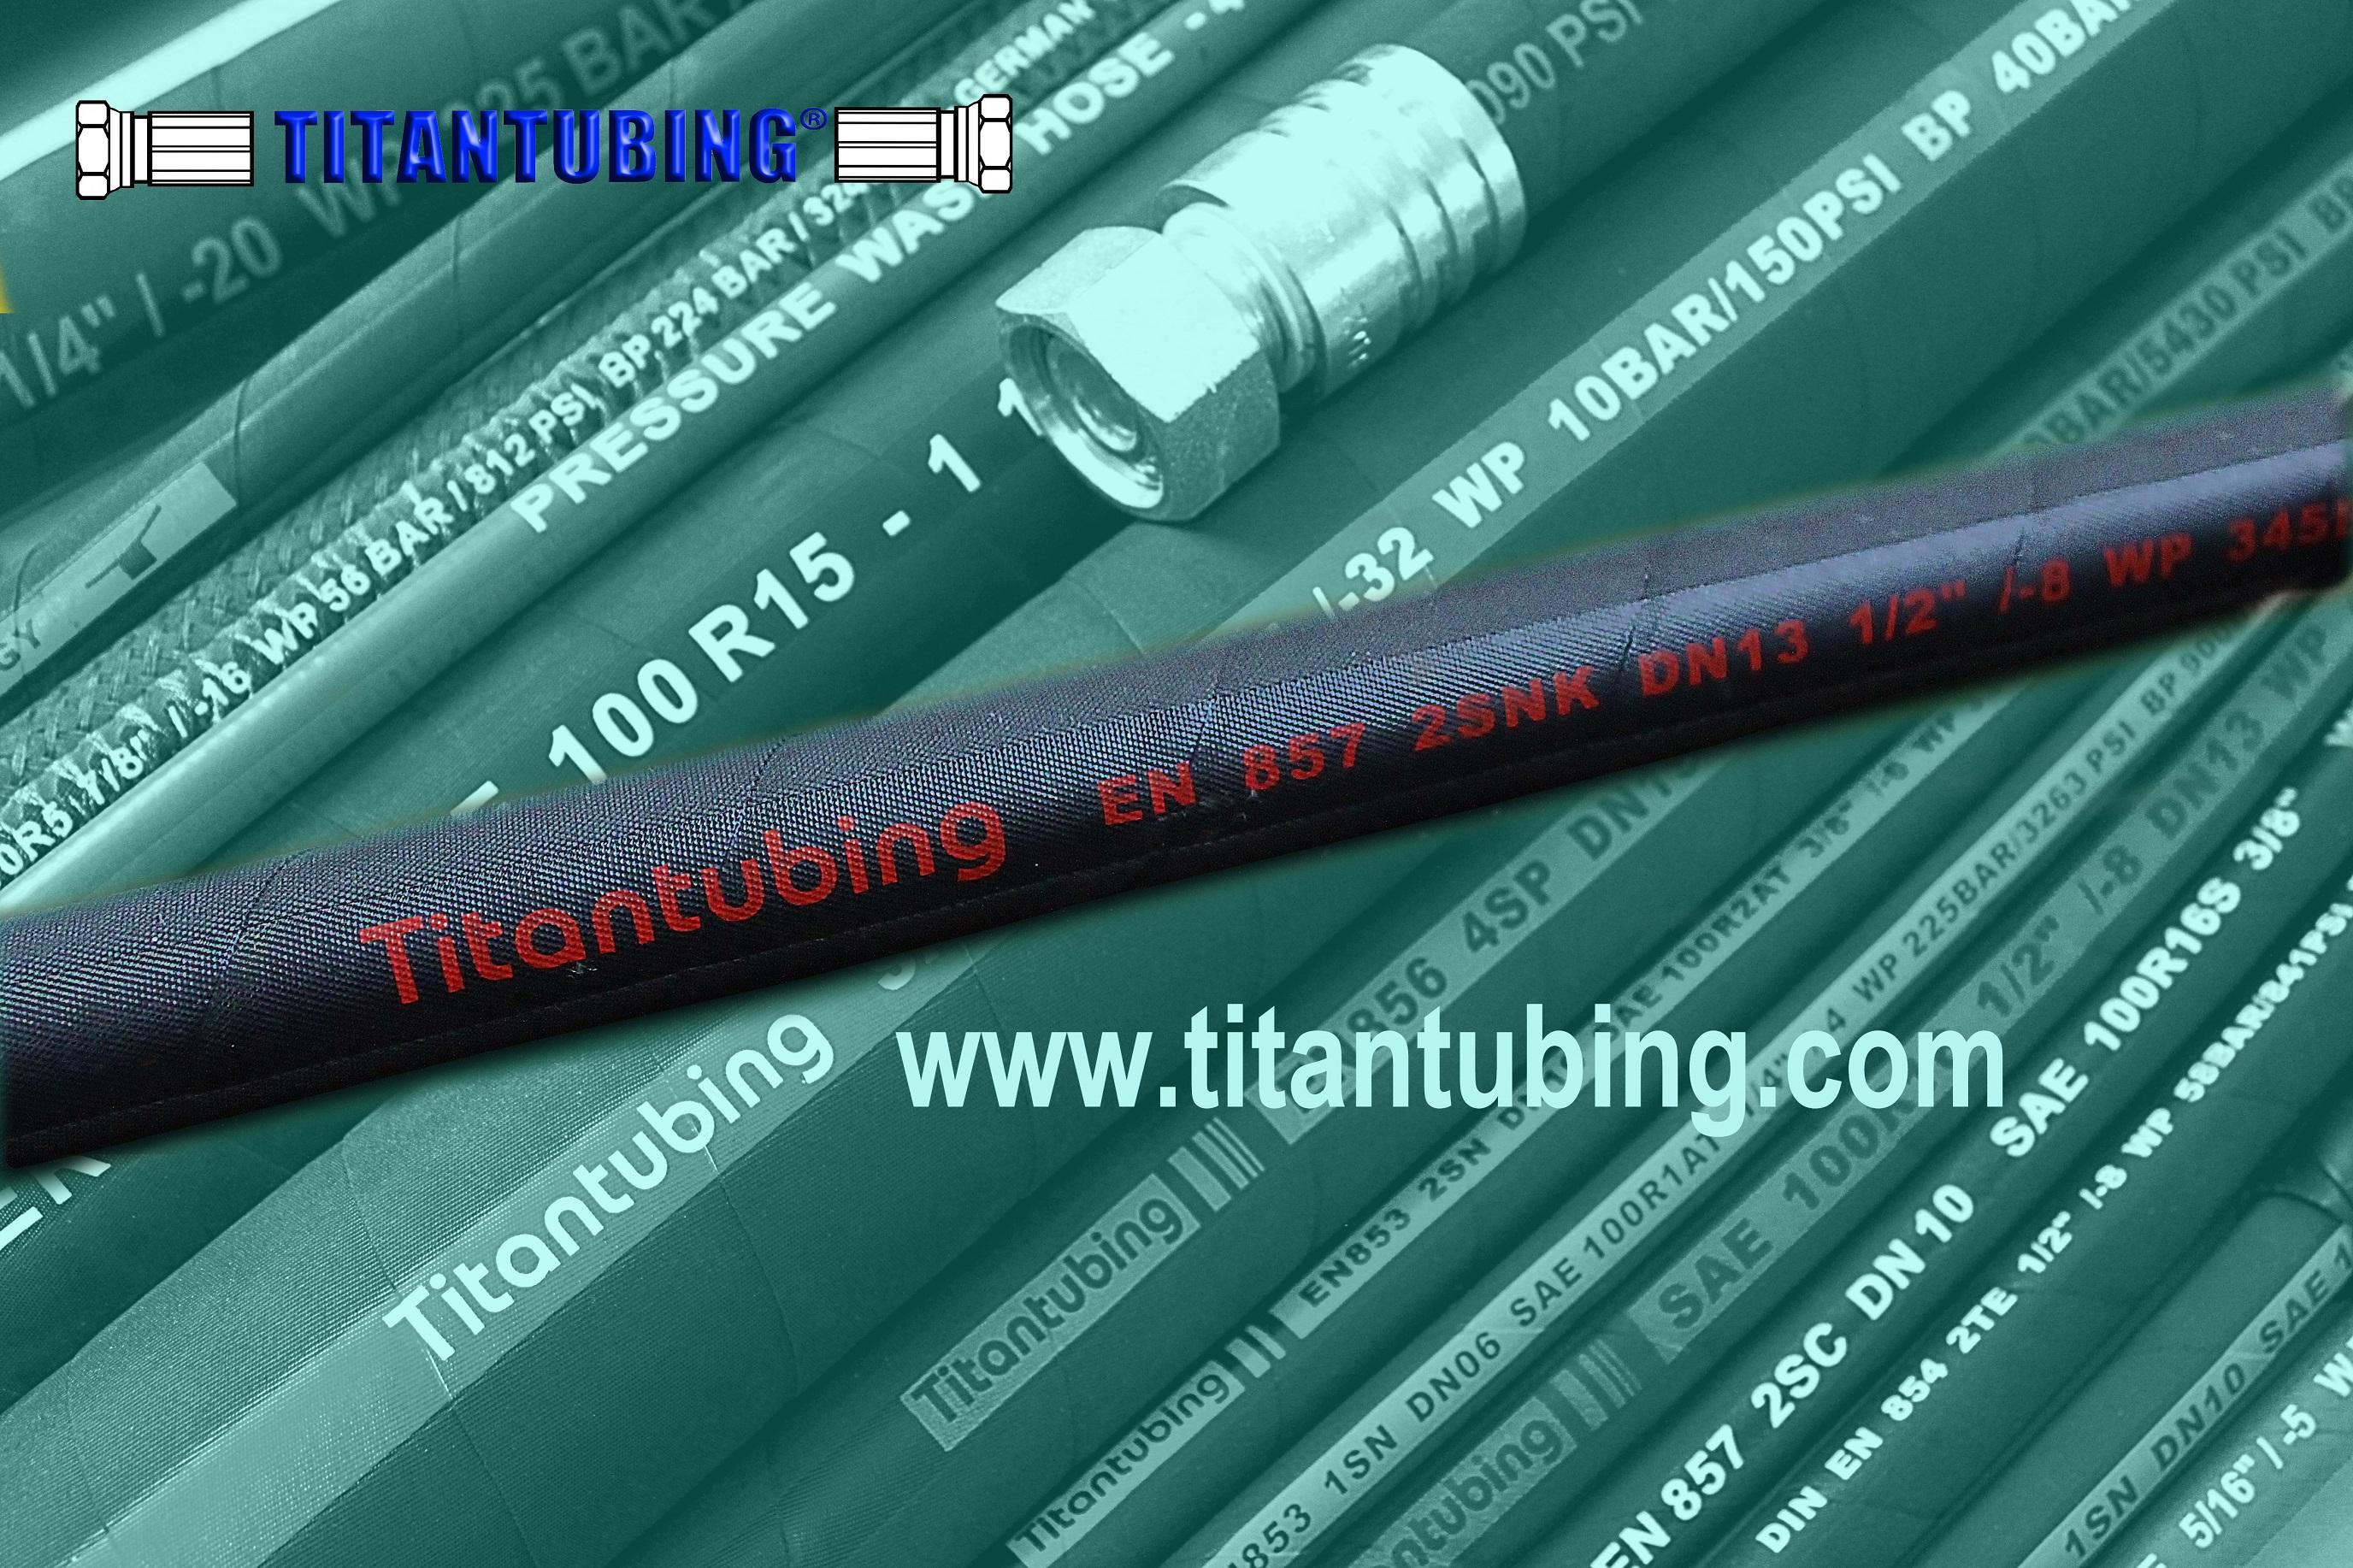 EN8542TE耐油橡胶管,多用途胶管  EN854 1TE EN854  EN854  1TE 钢丝编织缠绕高压胶管